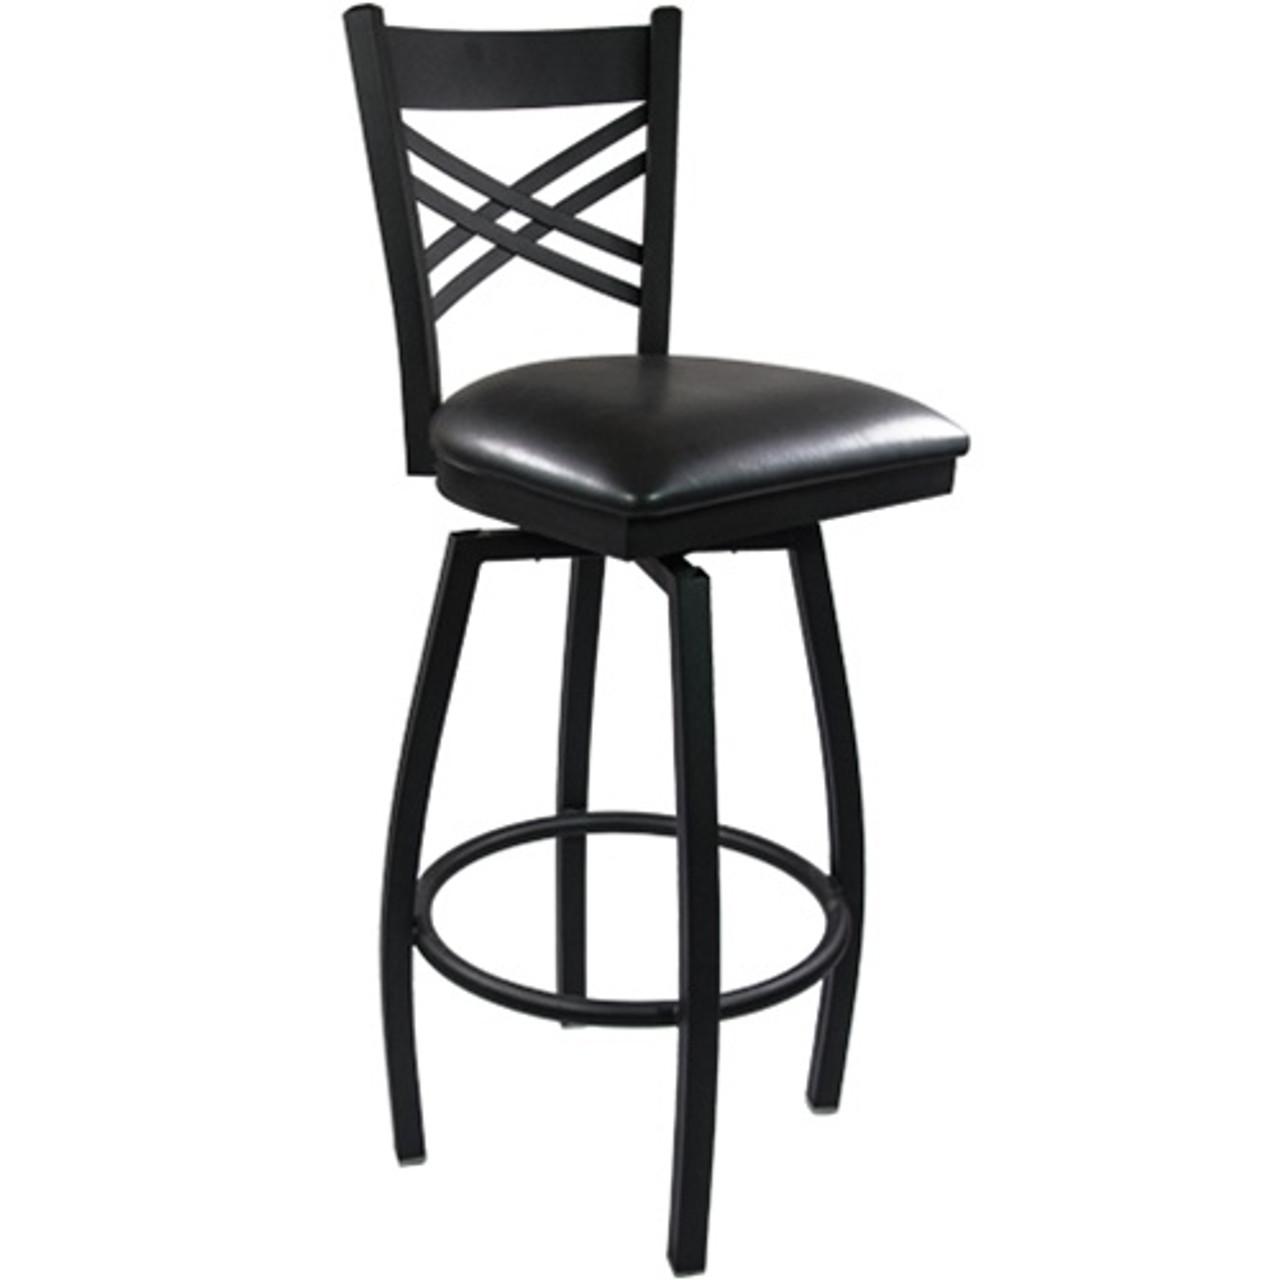 Fine Advantage Cross Back Metal Swivel Bar Stool Black Padded Bfdh 706688X Bk Bar Tdr Machost Co Dining Chair Design Ideas Machostcouk